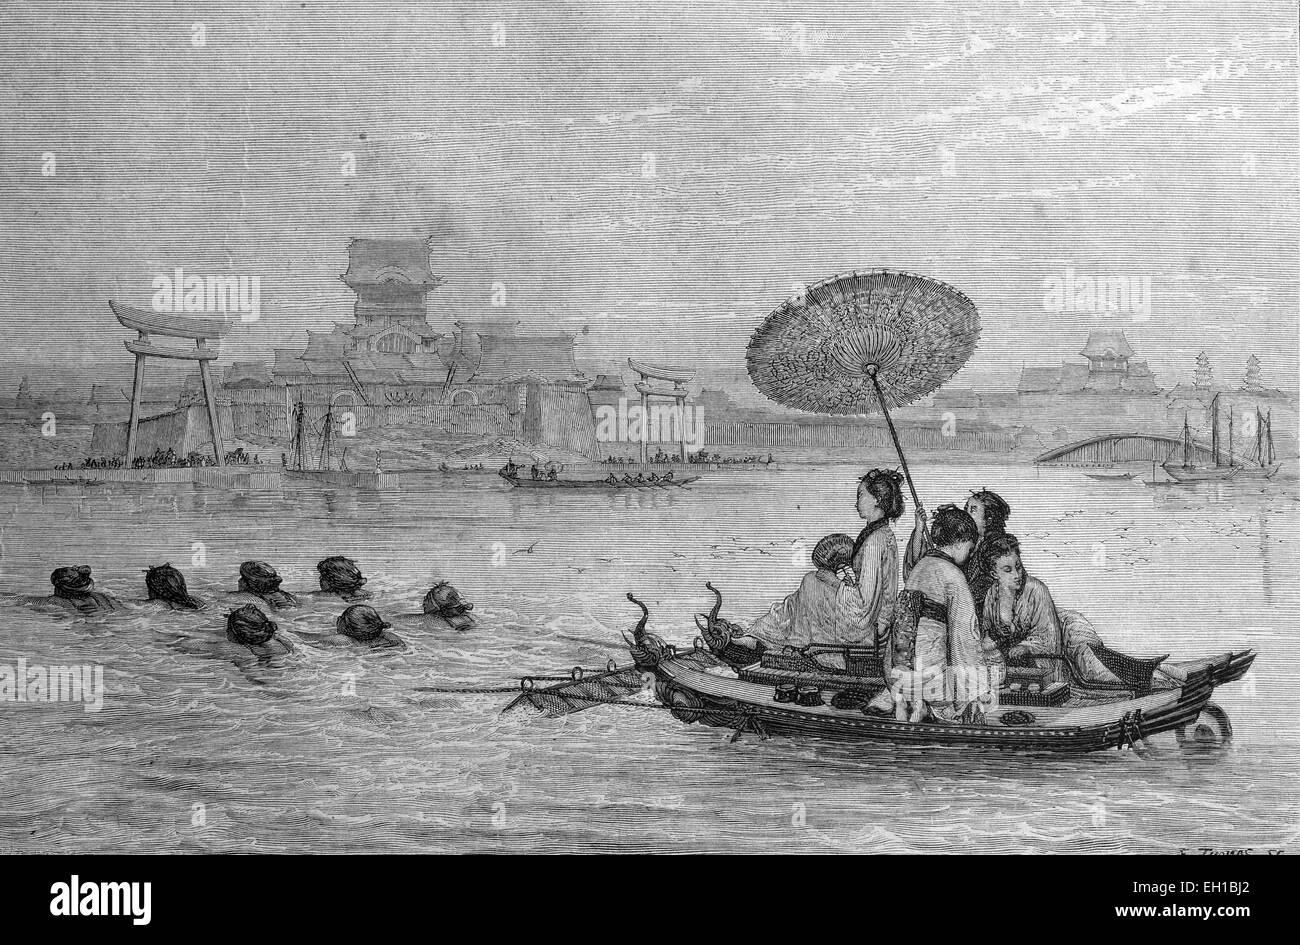 Japanese ferry, Japan, historic illustration, 1877 Stock Photo